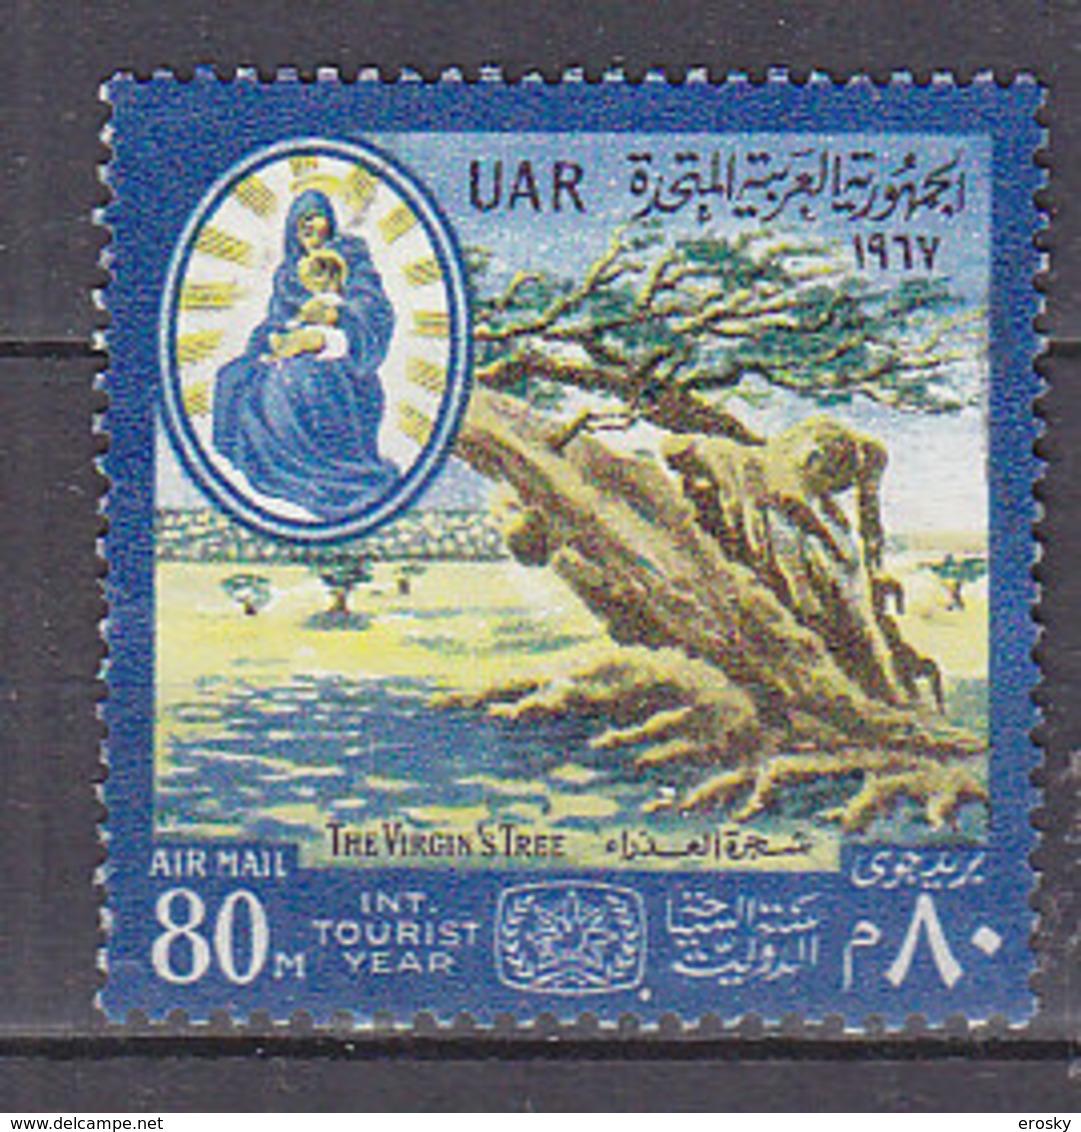 A0797 - EGYPTE EGYPT AERIENNE Yv N°105 - Poste Aérienne